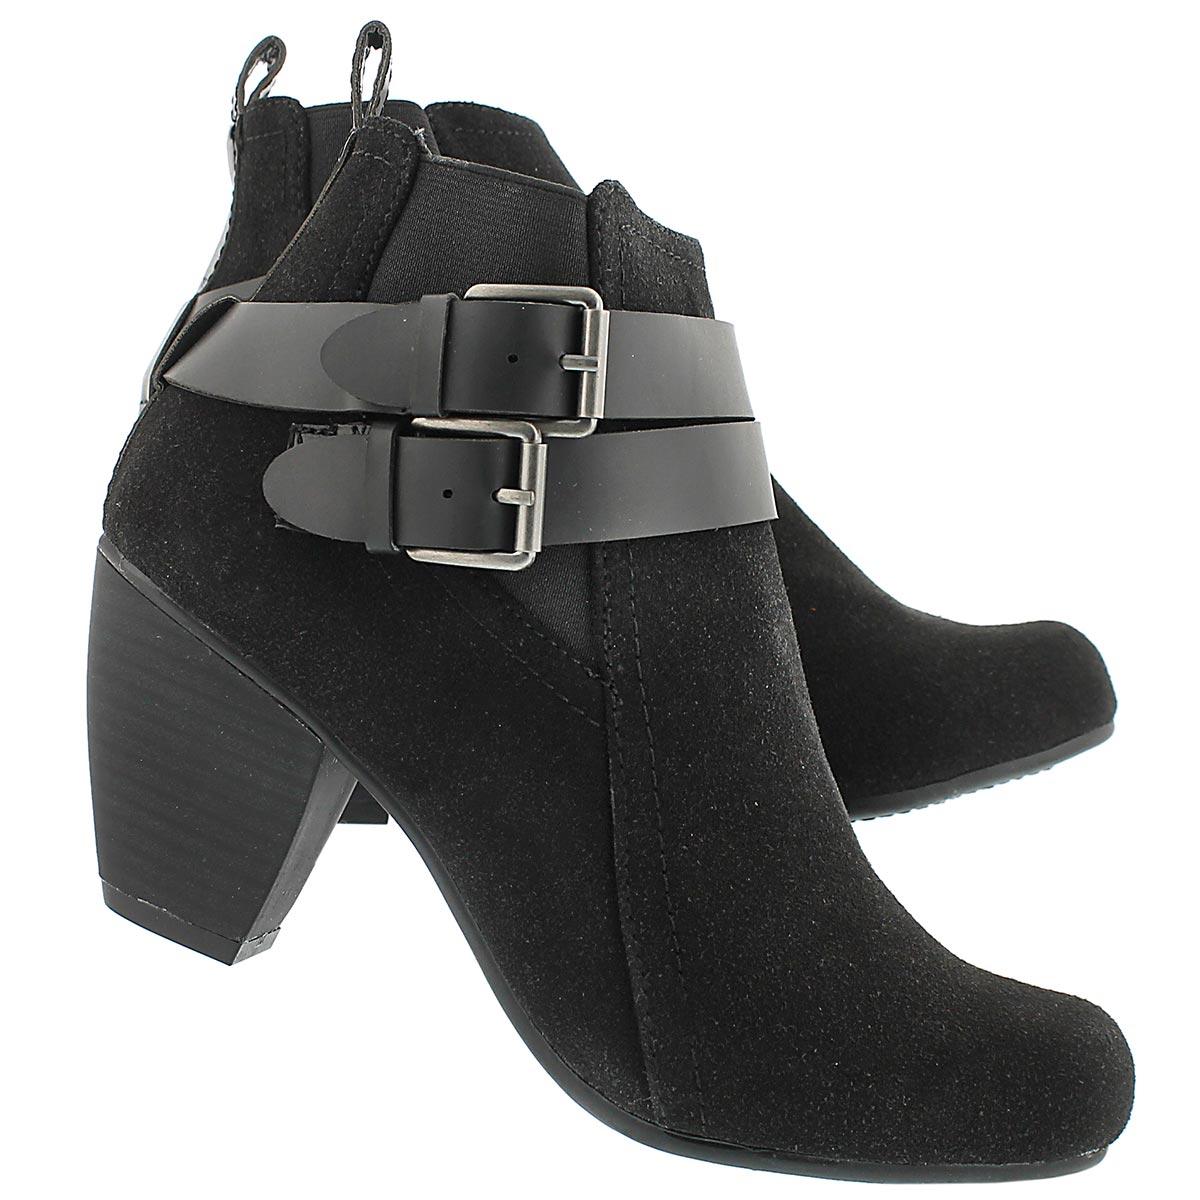 Lds Danica black lo dress ankle boot